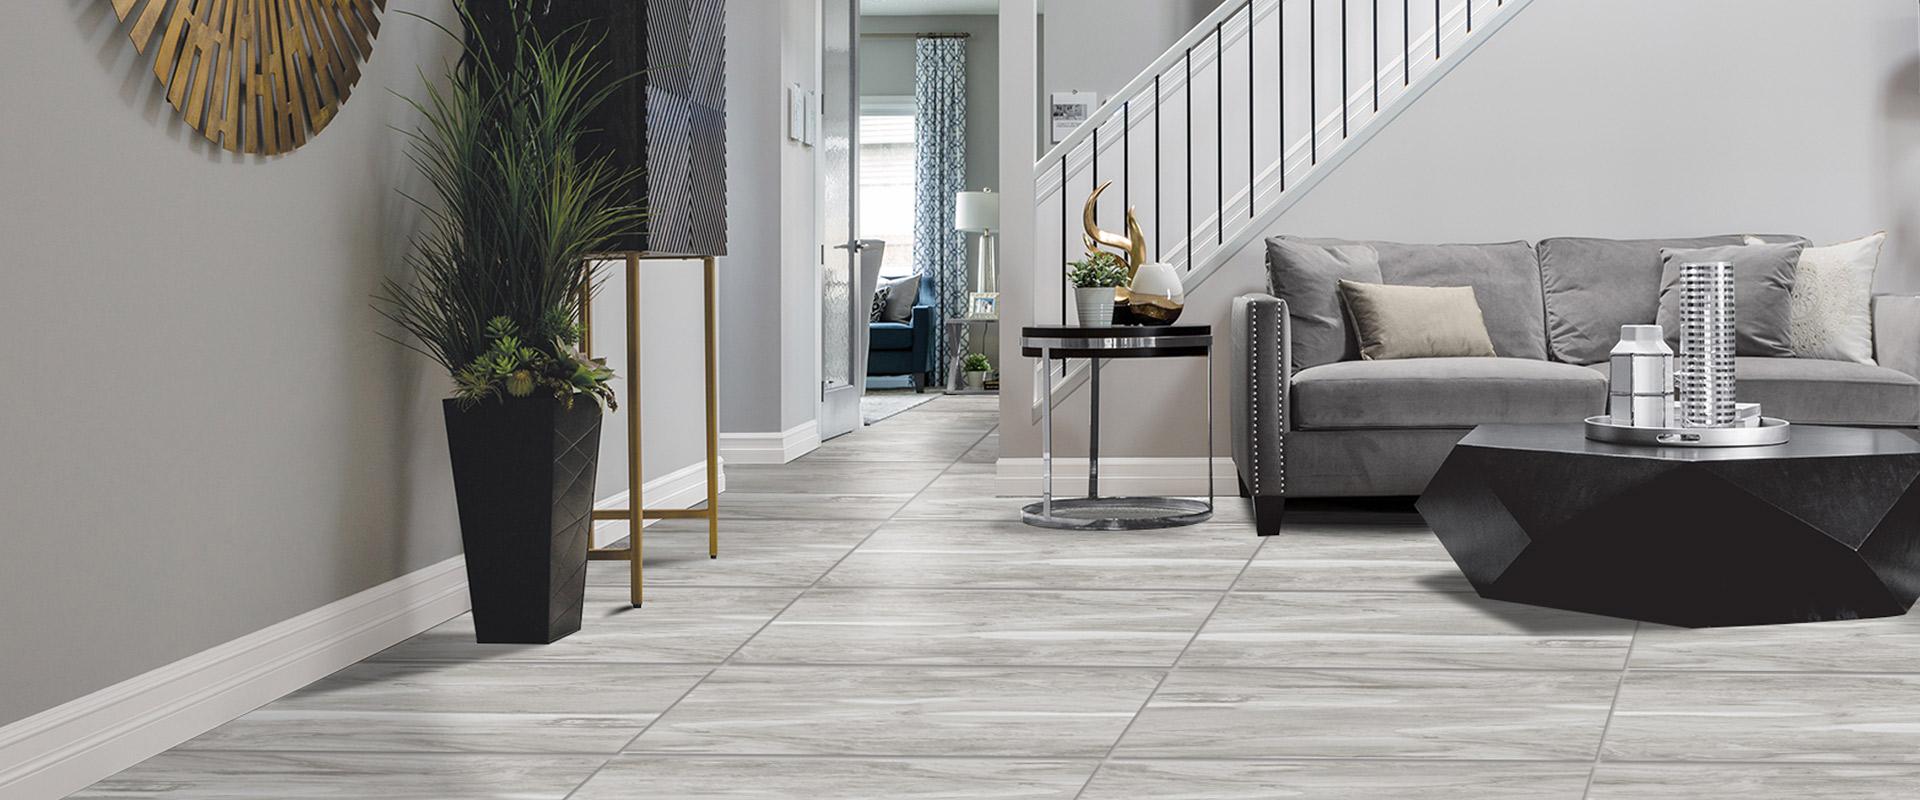 Stile | Porcelain, Ceramic, Floor, Bathroom, Kitchen Wall ...